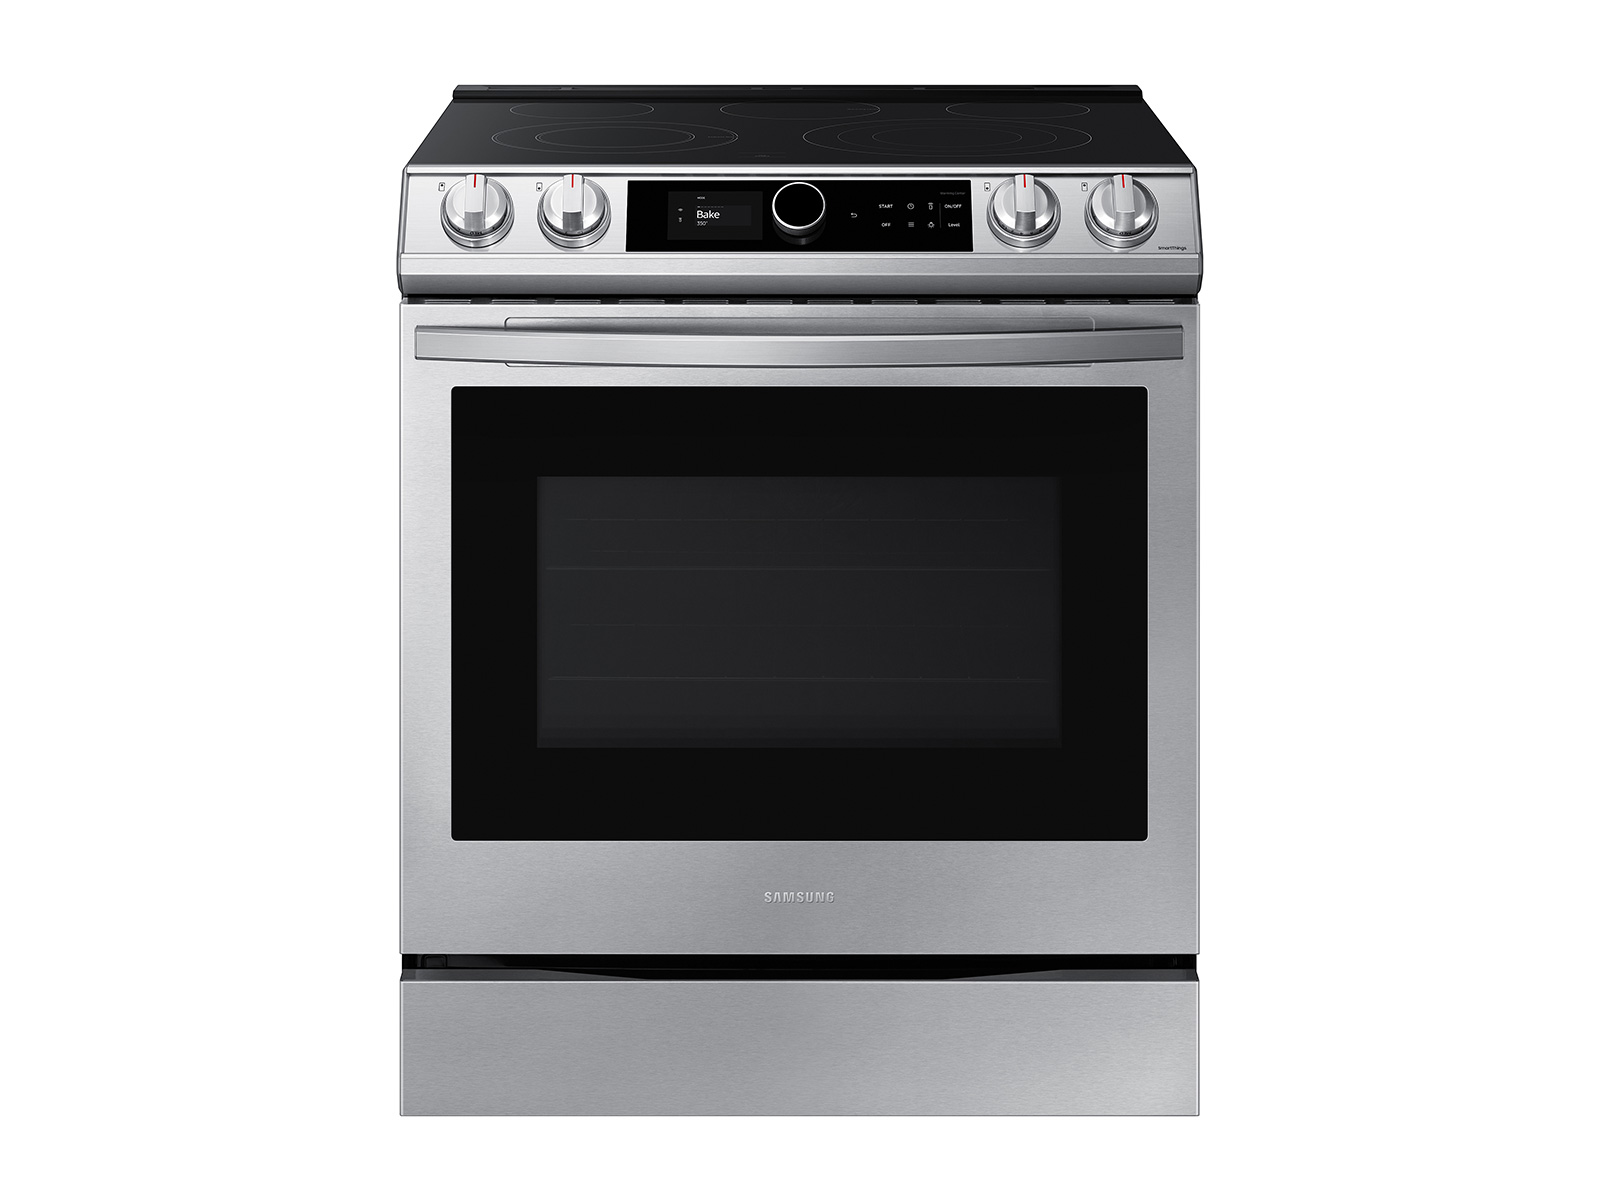 28 cu. ft. Family HubTM 4-door refrigerator, 6.3 cu. ft. electric range, microwave and Smart Linear dishwasher package